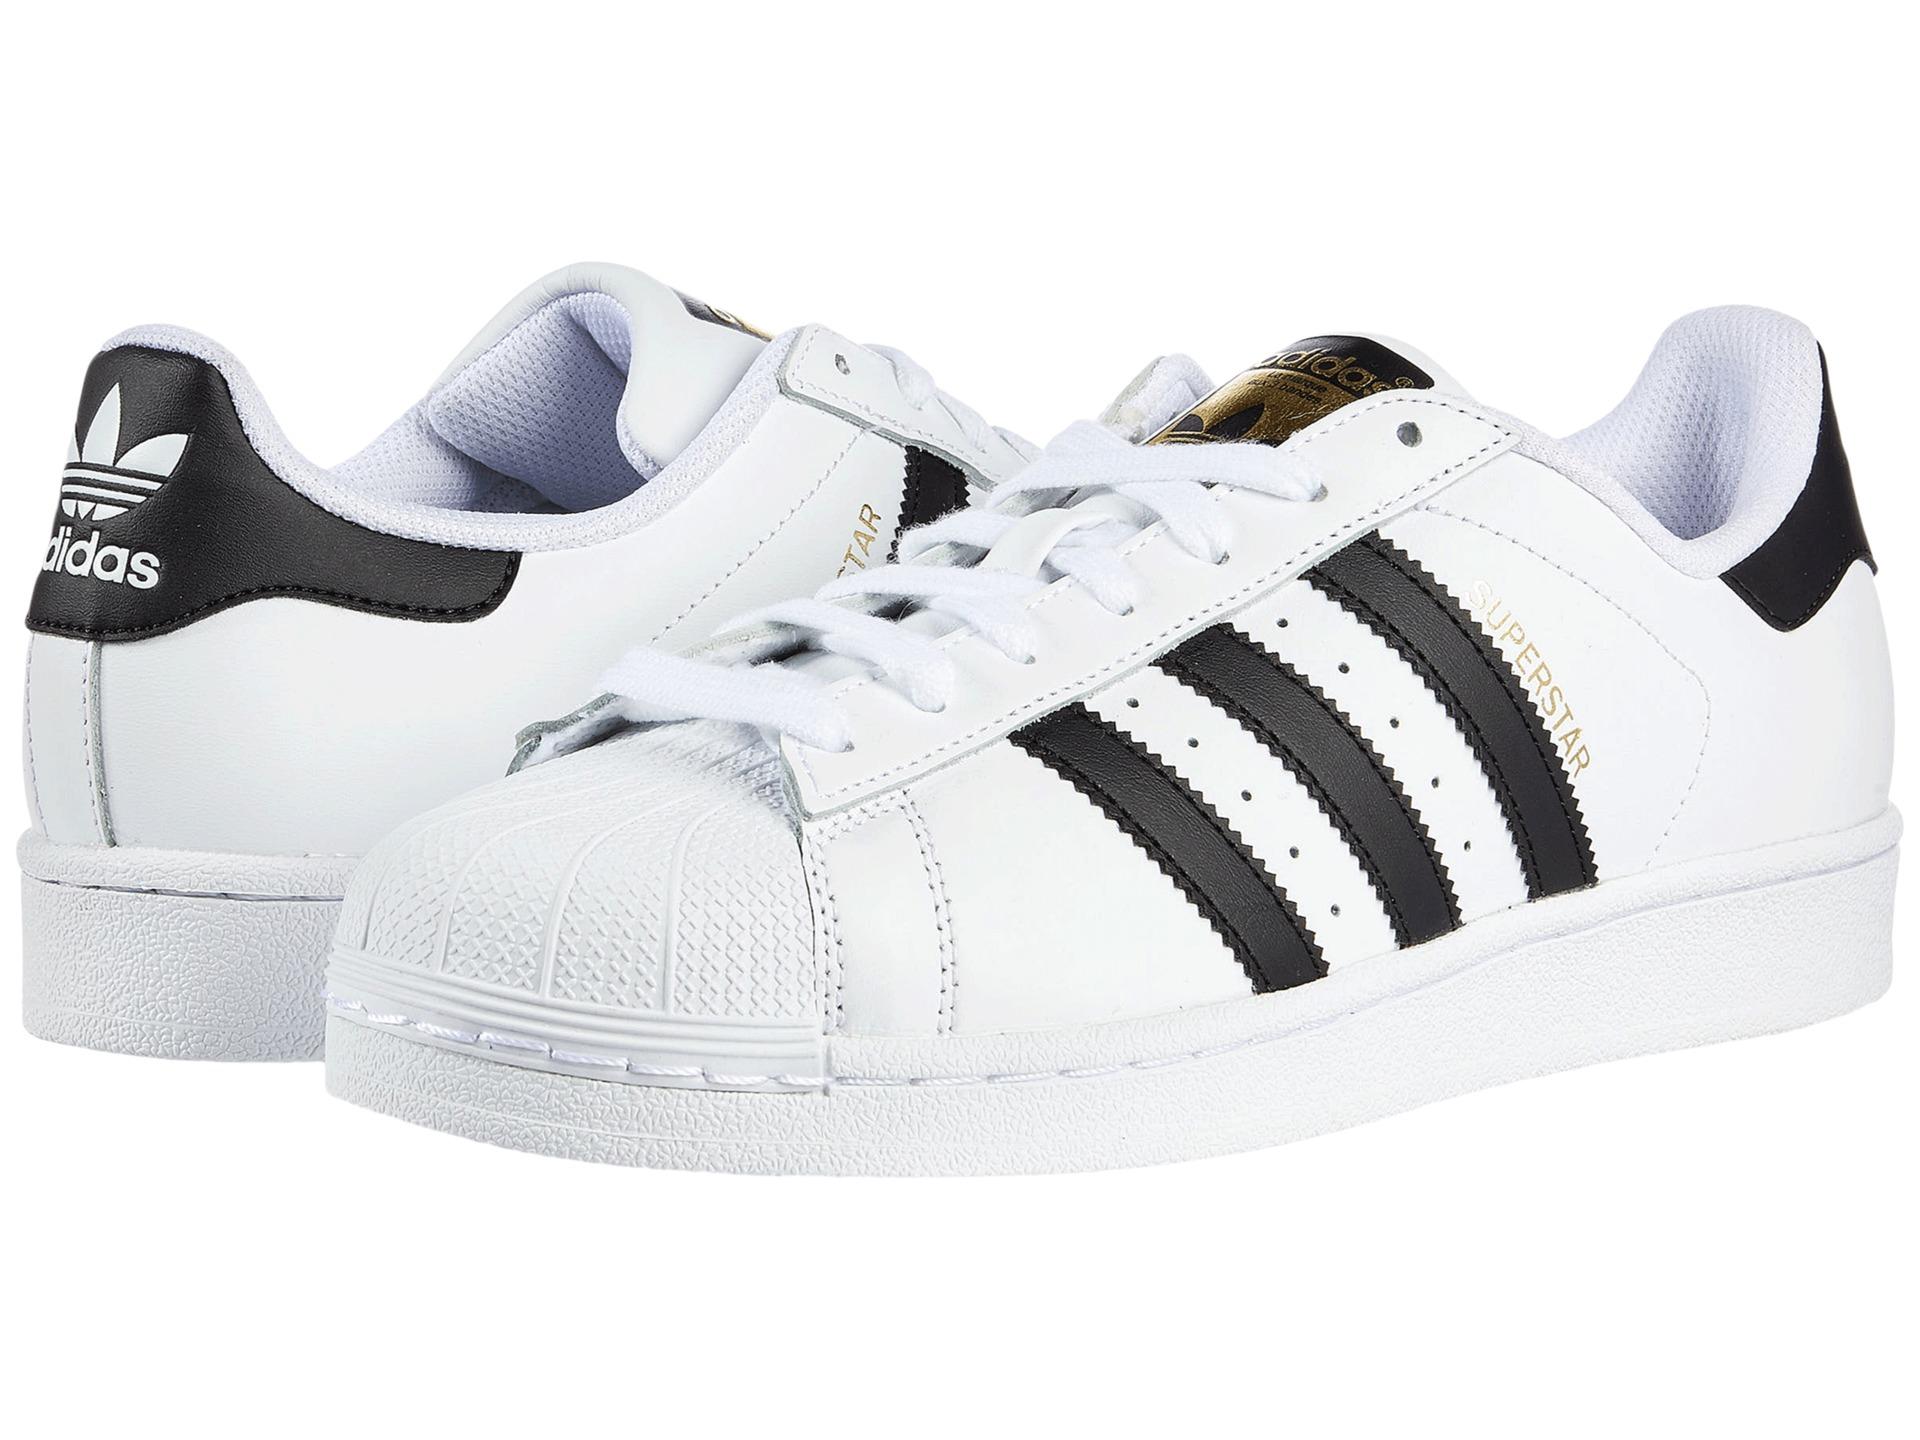 Shoes Similar Adidas Superstar